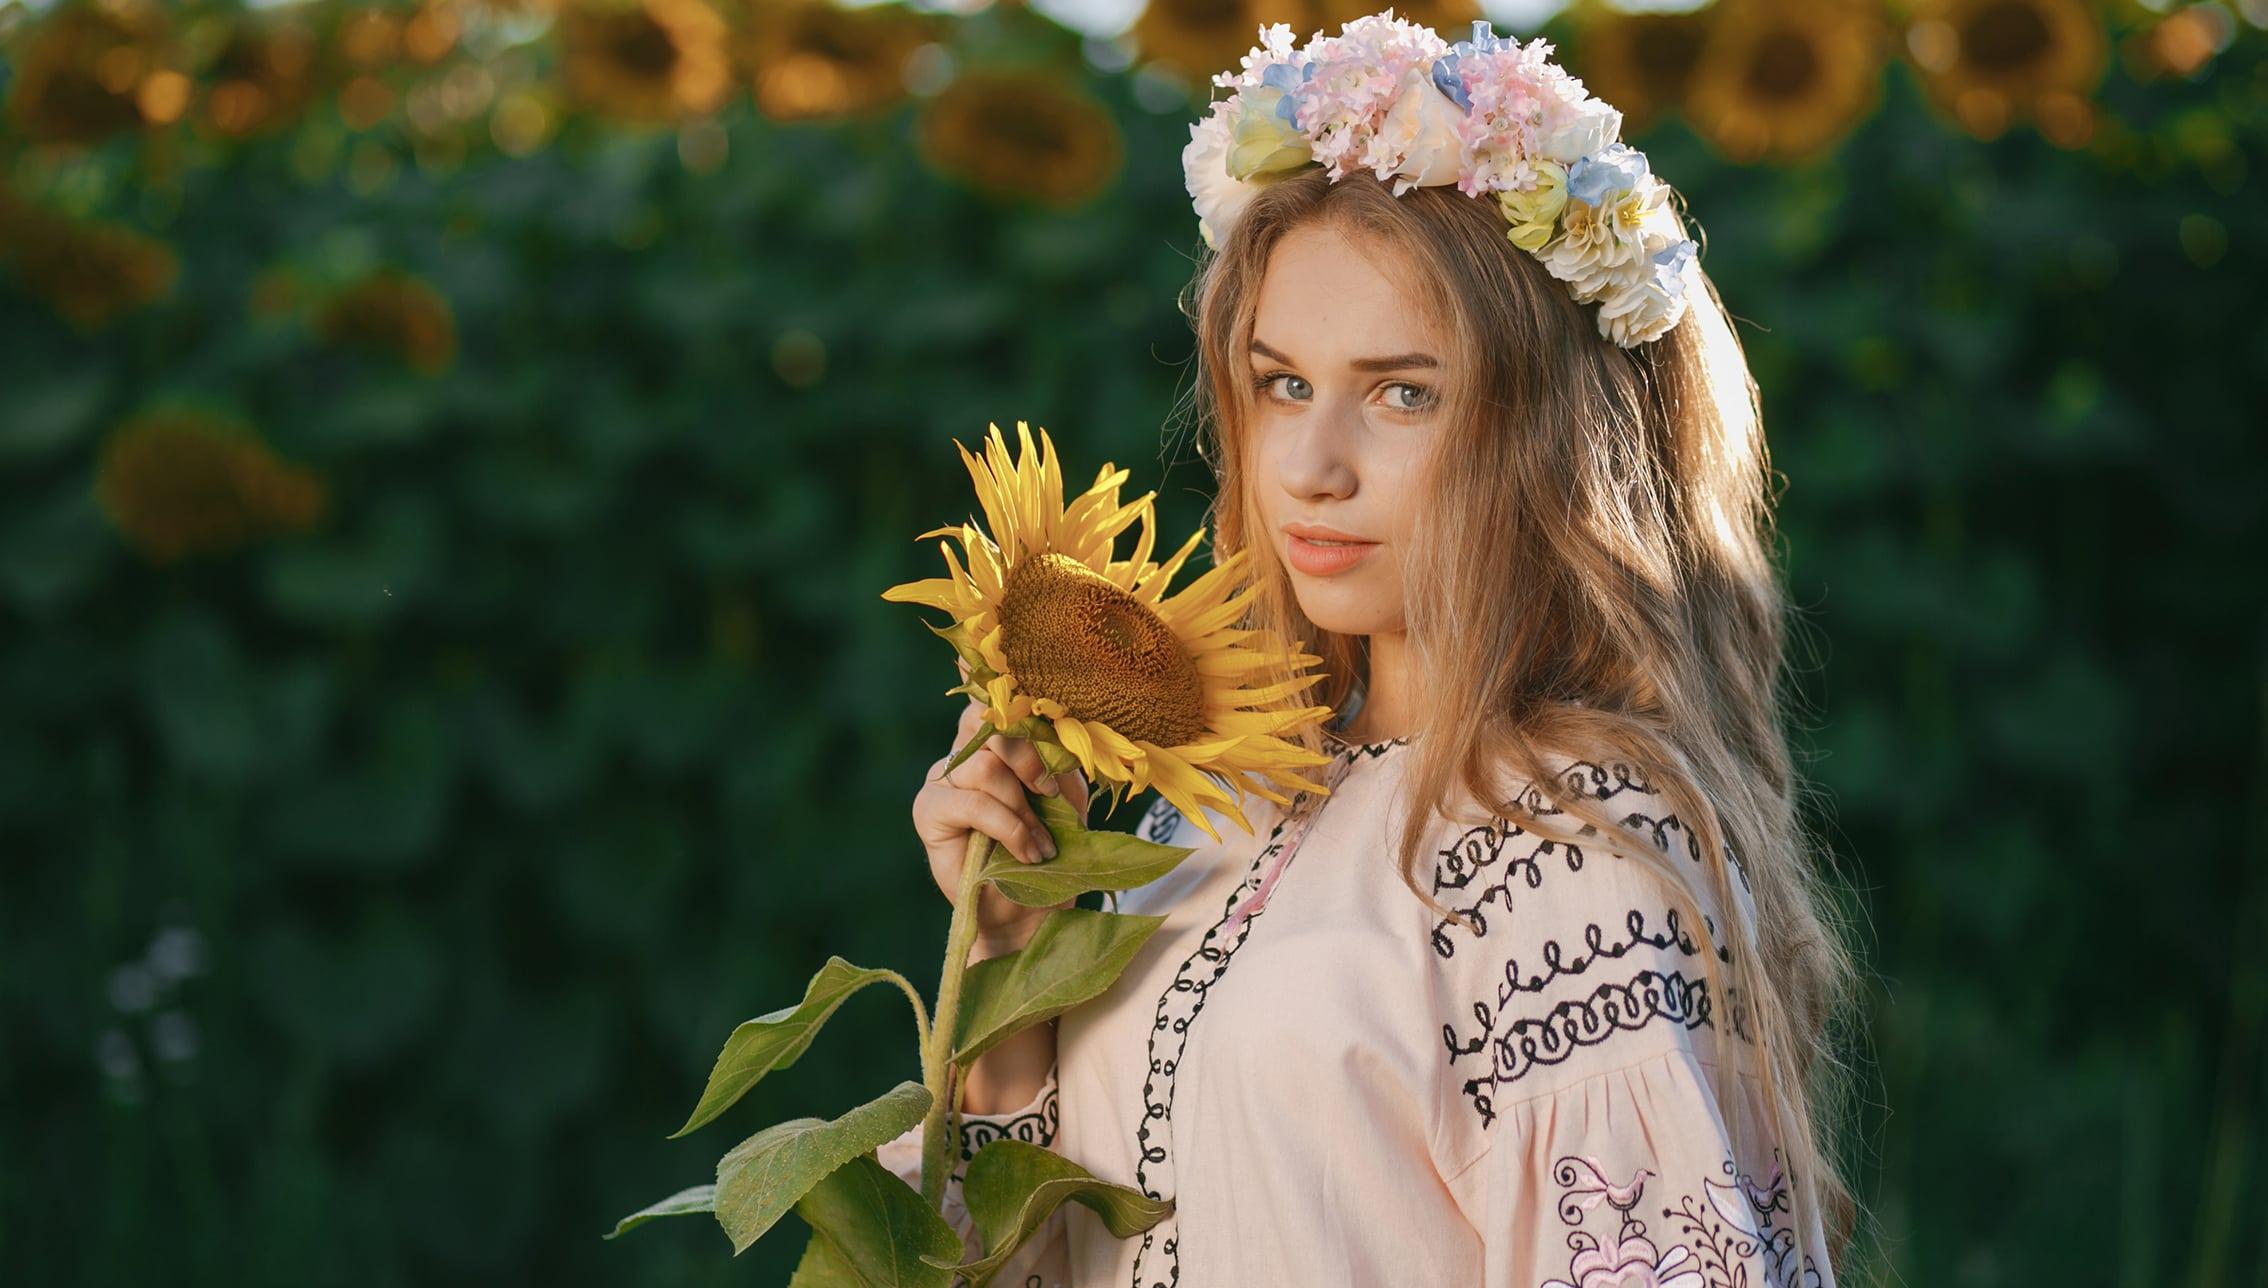 Dating Ukrainian women for marriage